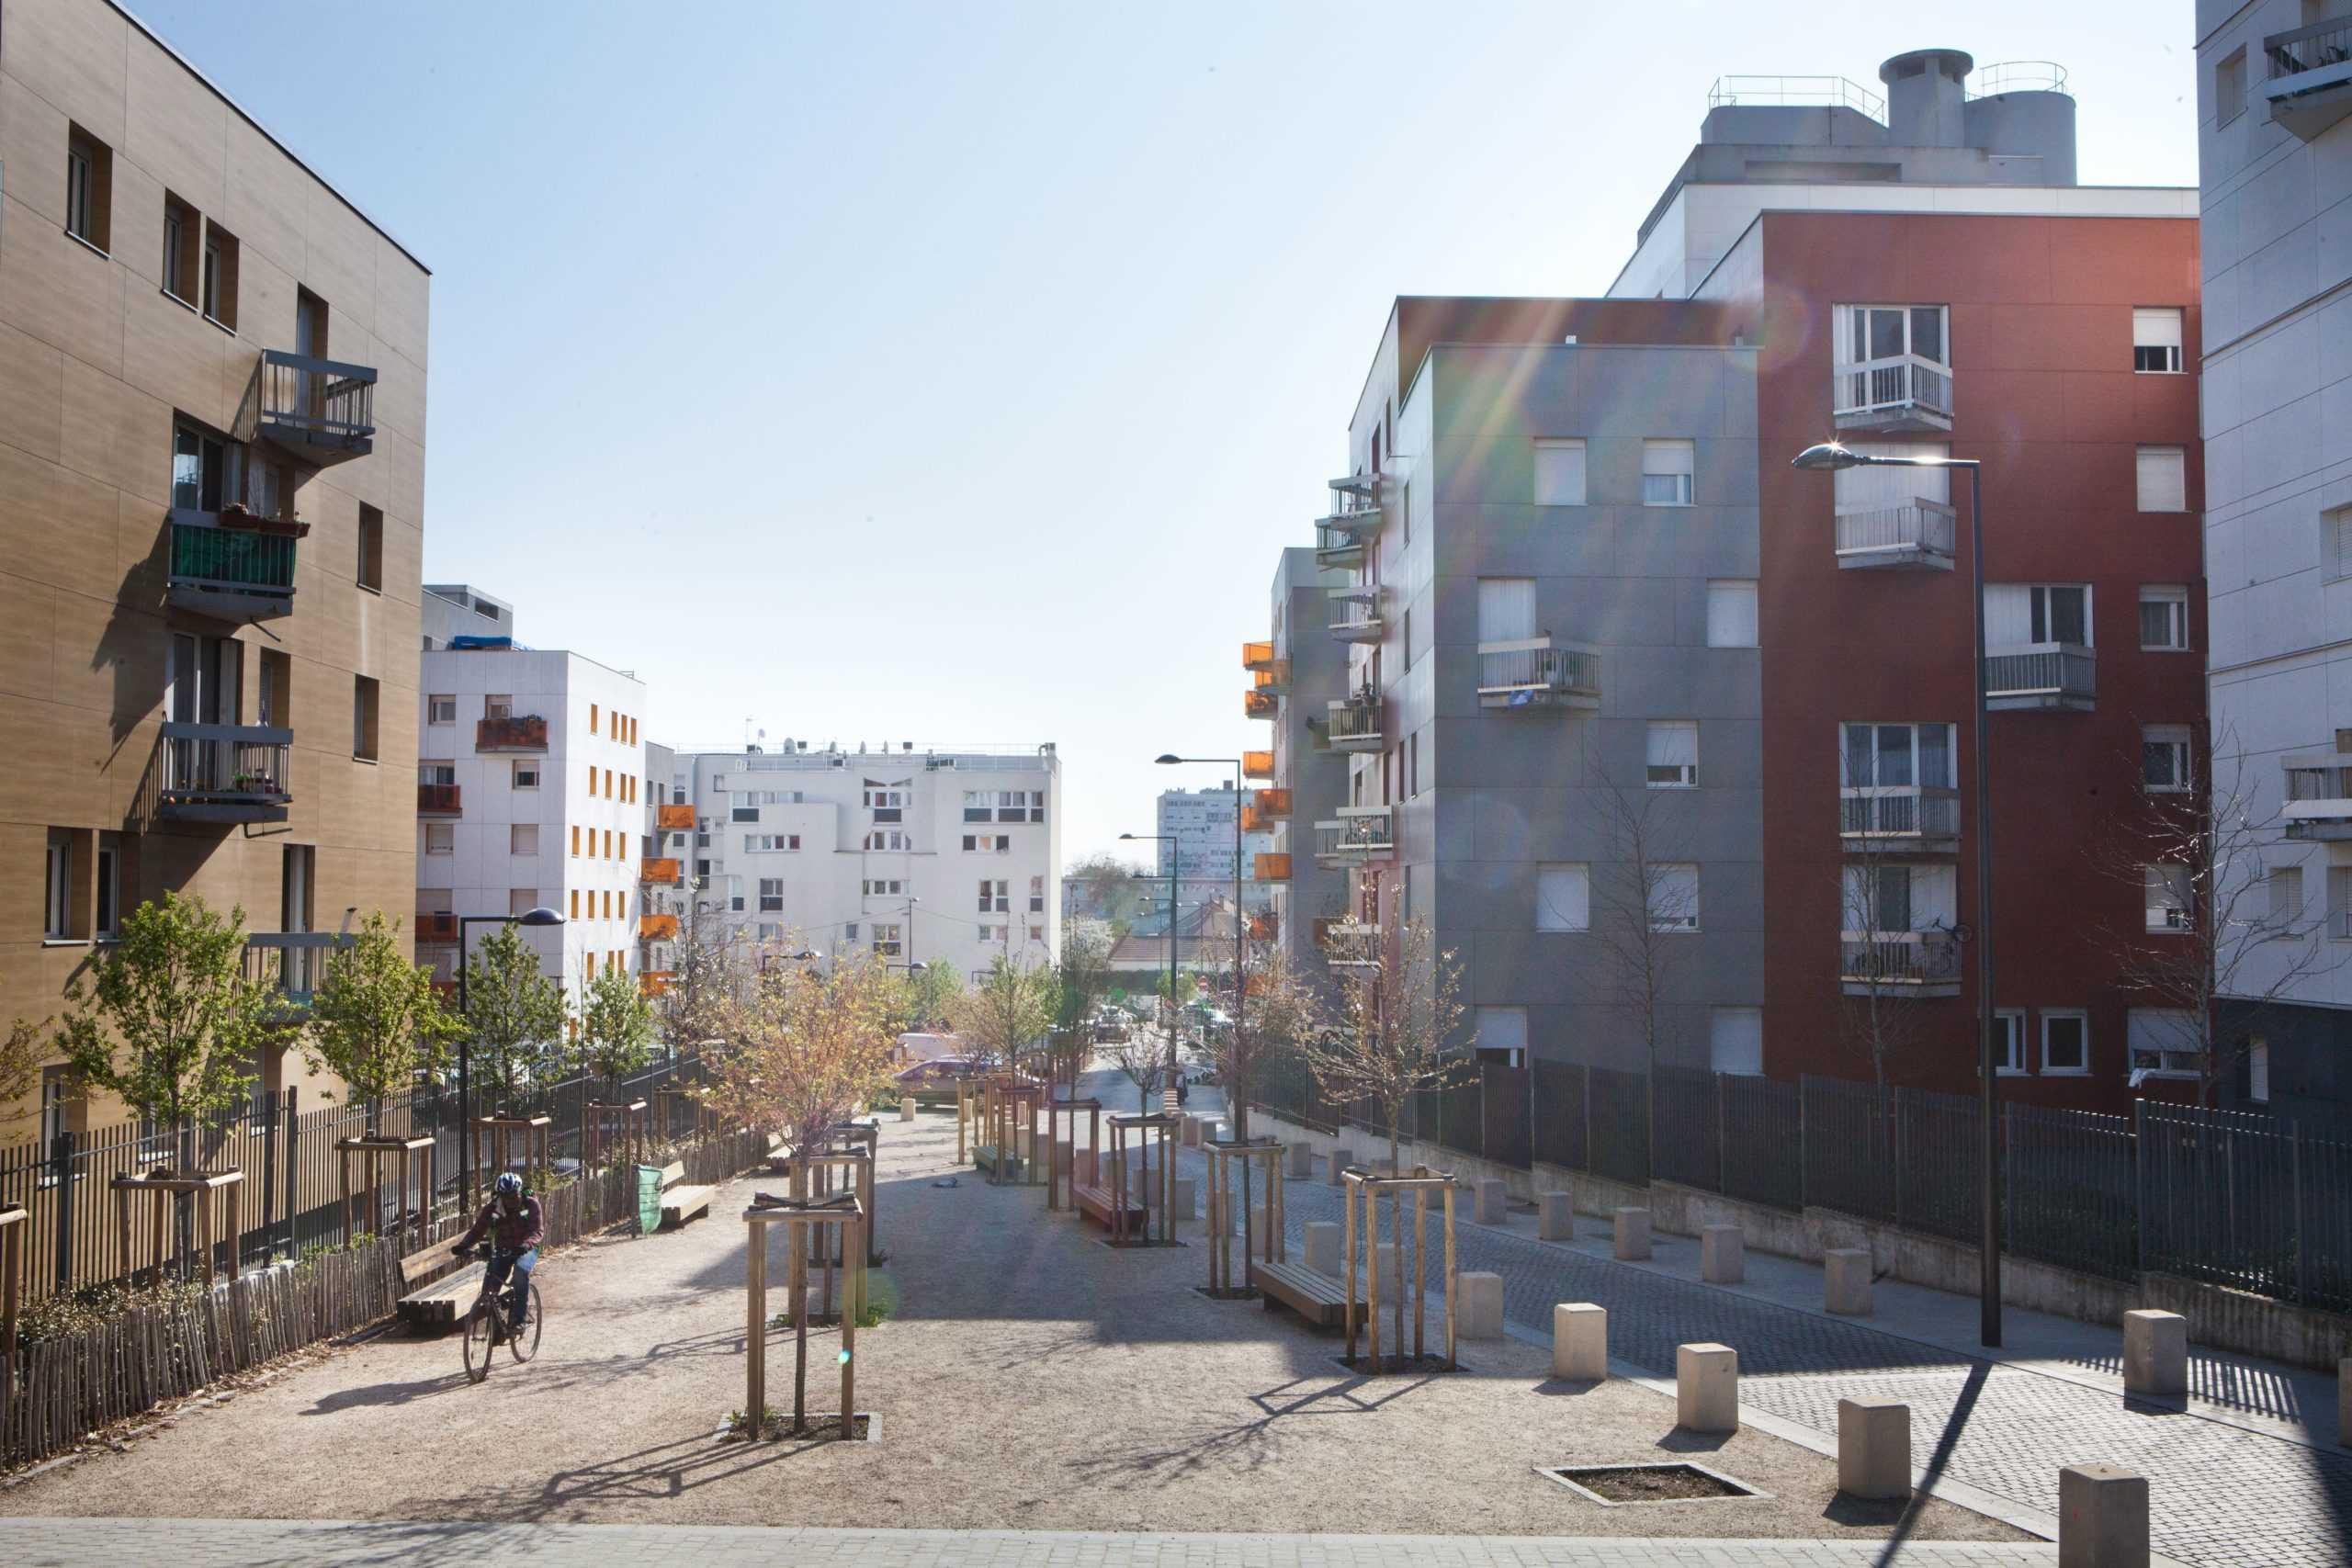 logement_stephane-lagoutte-myop-min-scaled.jpg